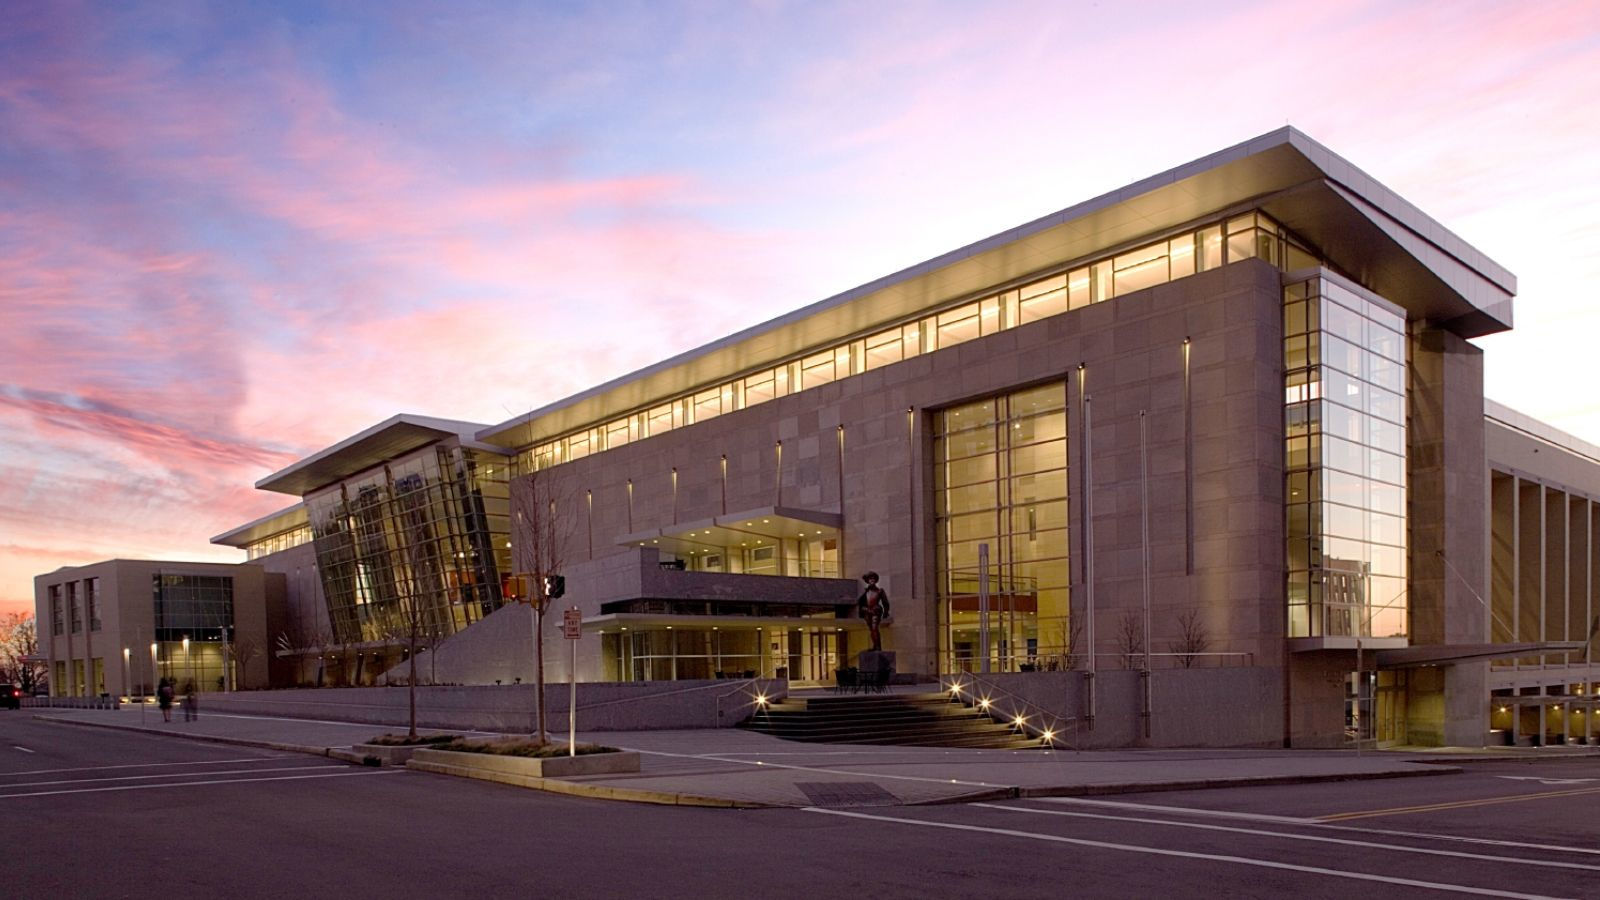 HD-Raleigh-Convention-Center-east.jpg